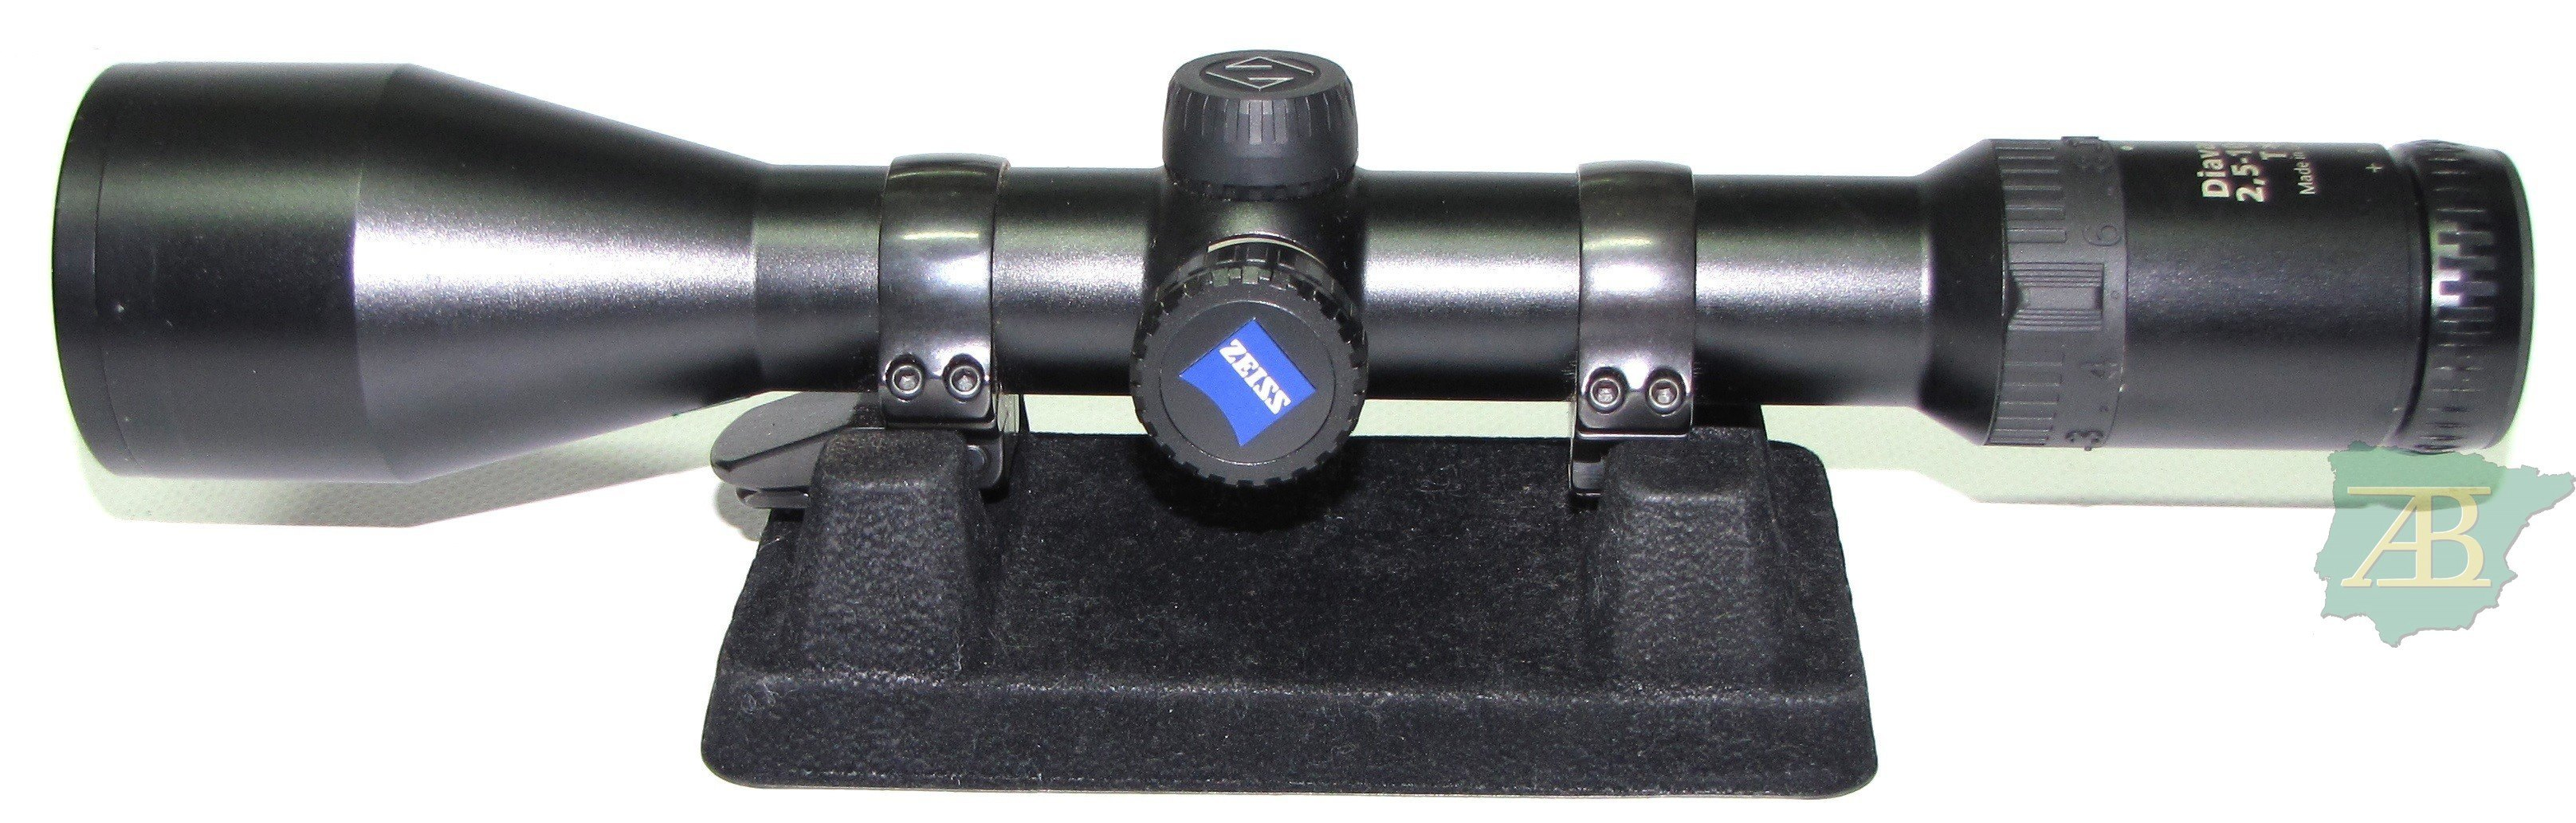 VISOR ZEISS DIAVARI V 2,5-10X50 T* RI Ref. V36